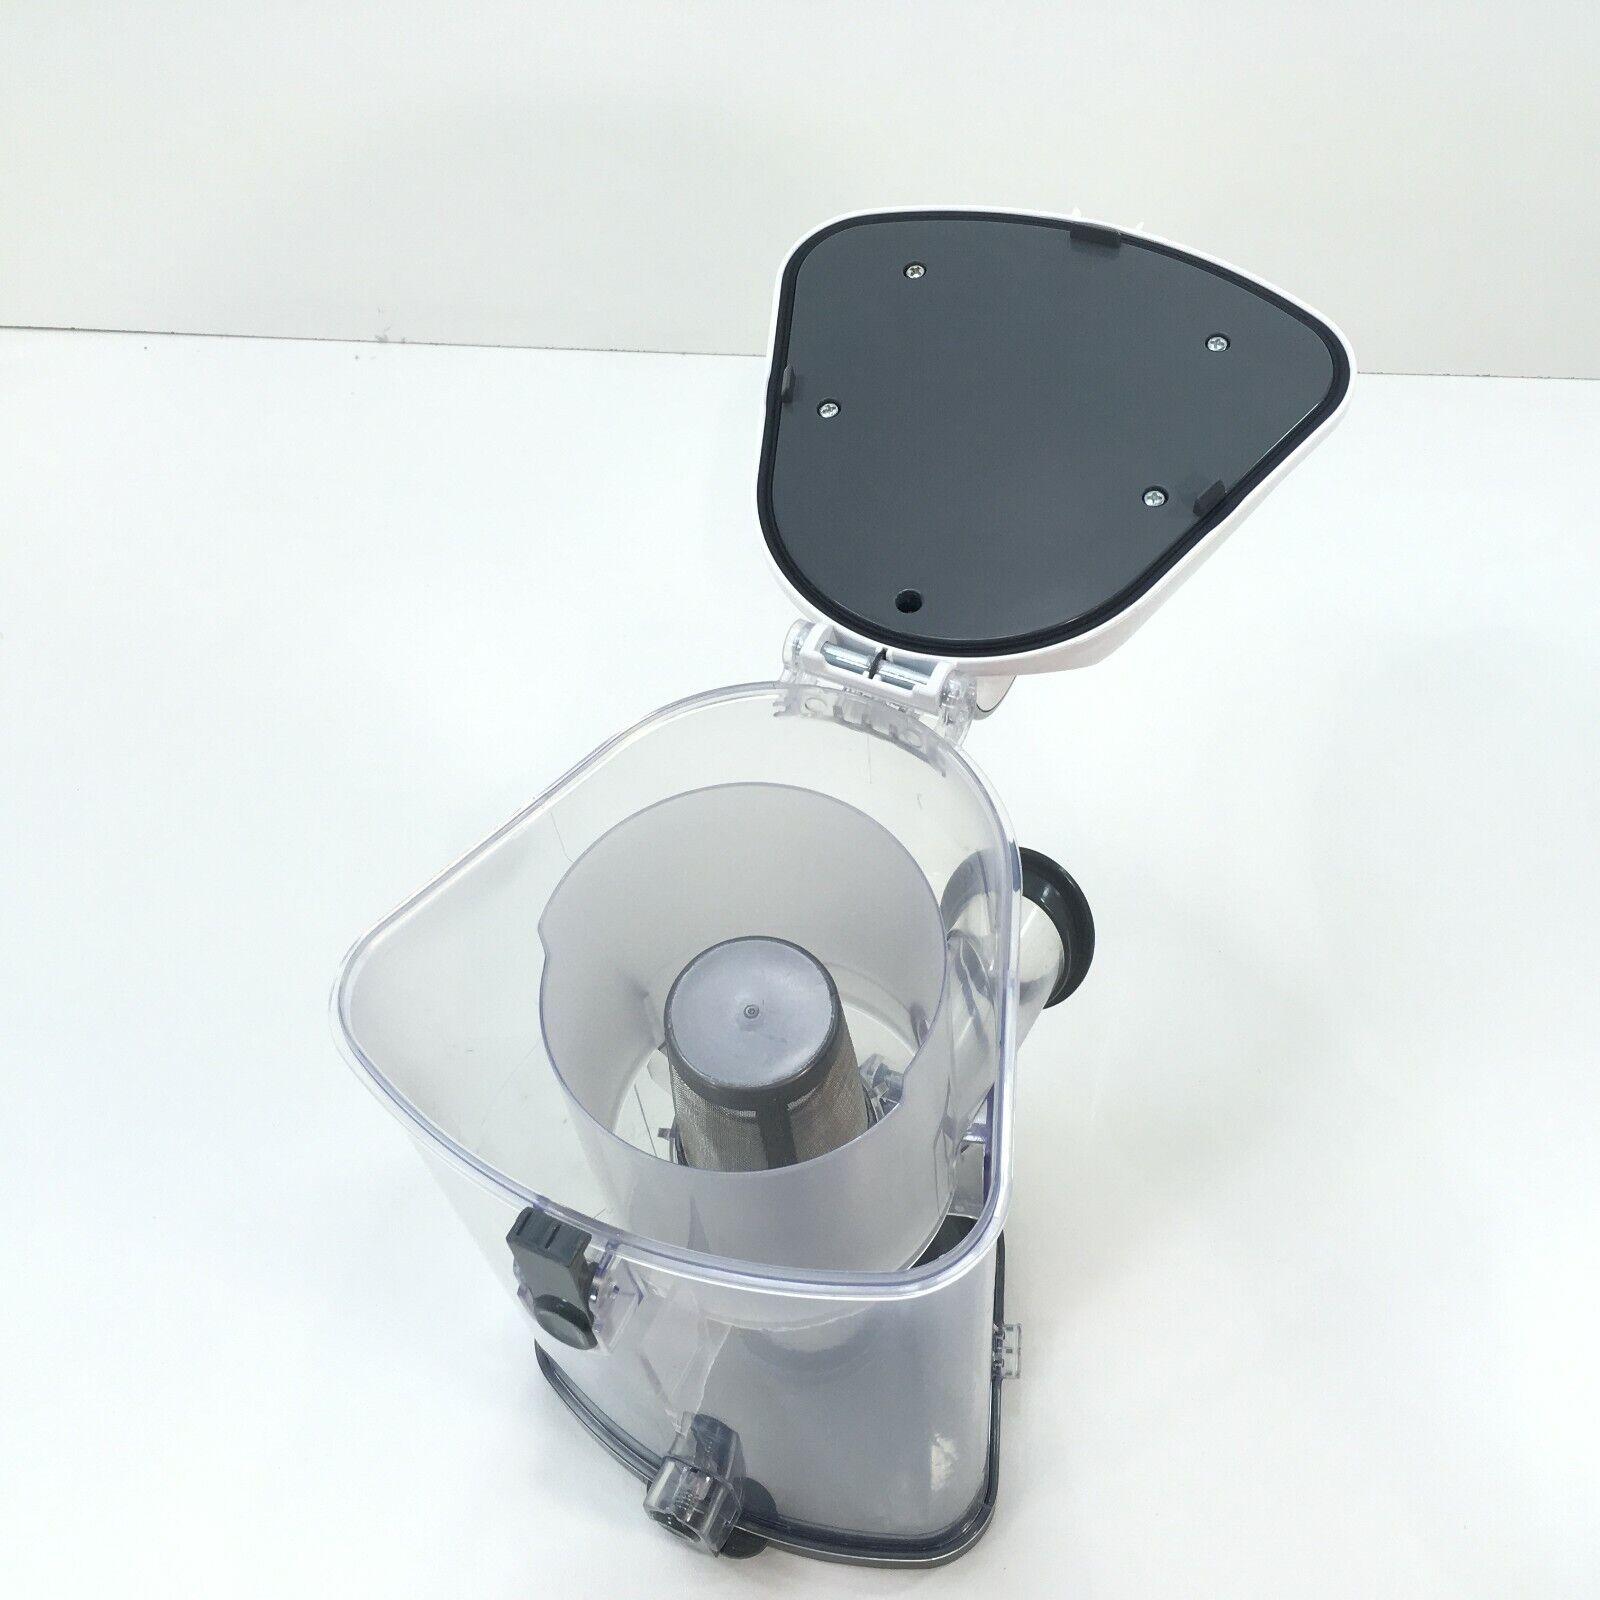 Shark Navigator NV355 NV357 NV358 Rear Wheel Kit I